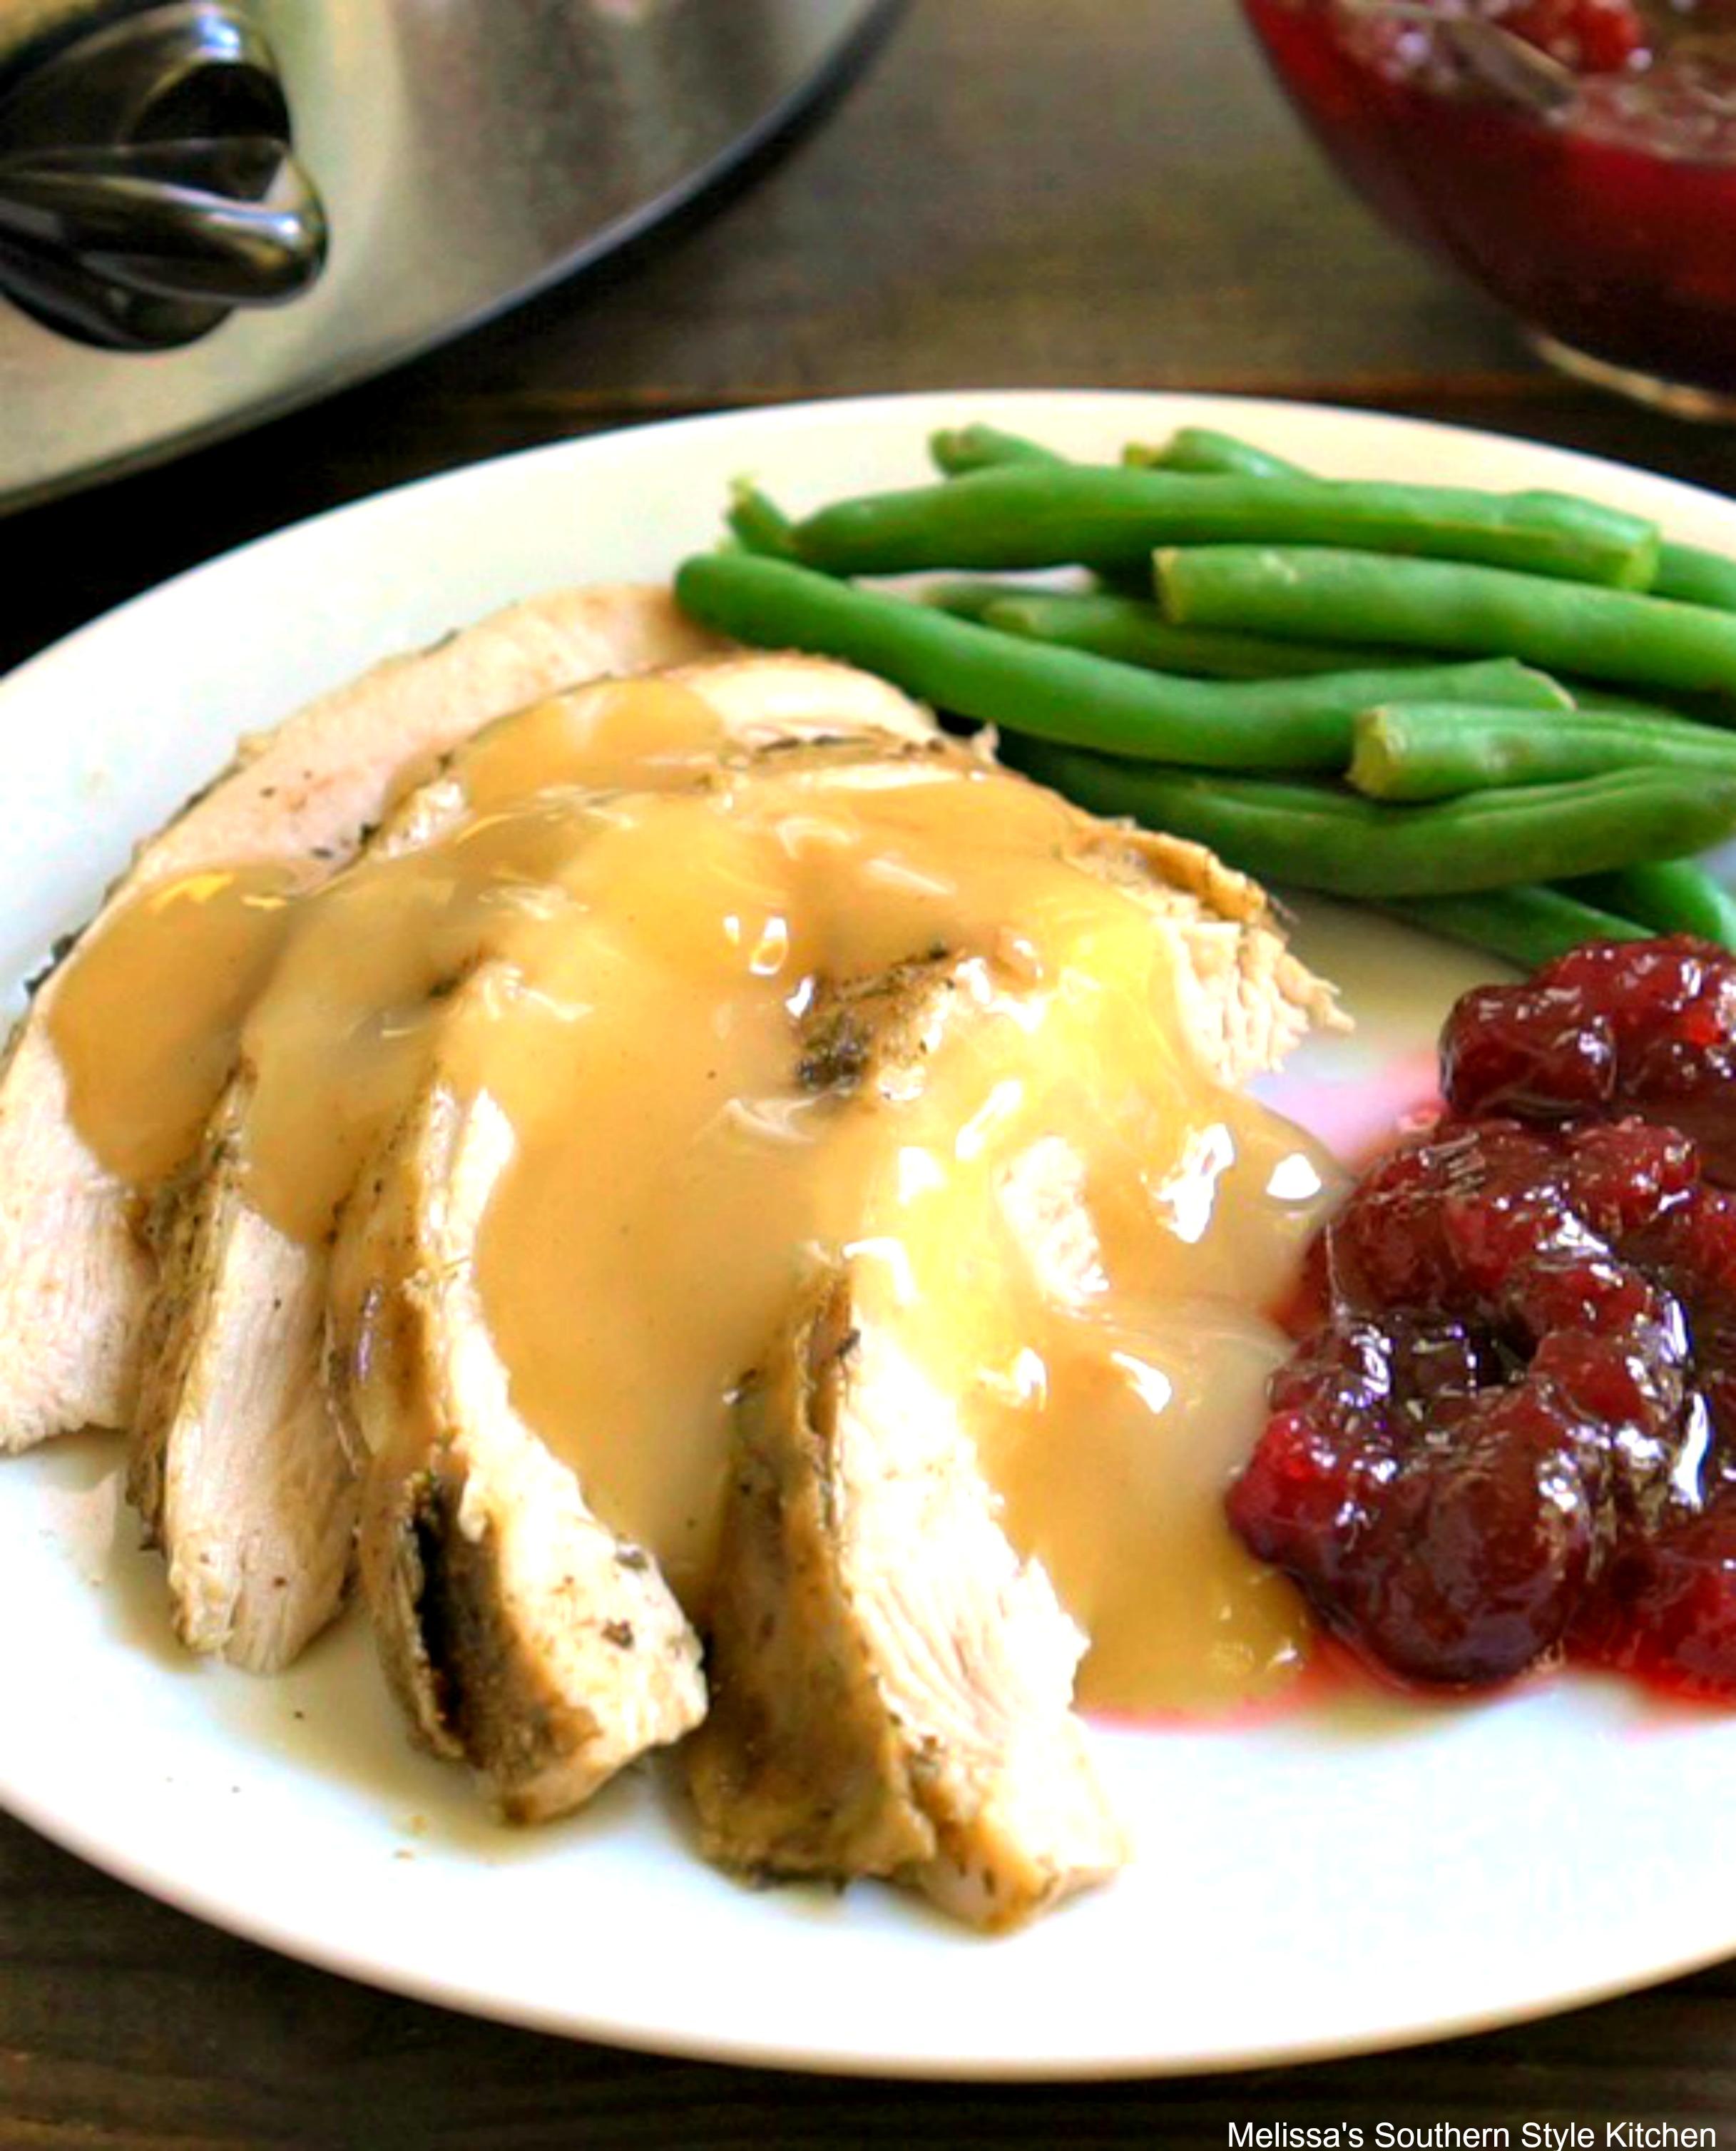 Slow Cooked Turkey Breast - melissassouthernstylekitchen.com